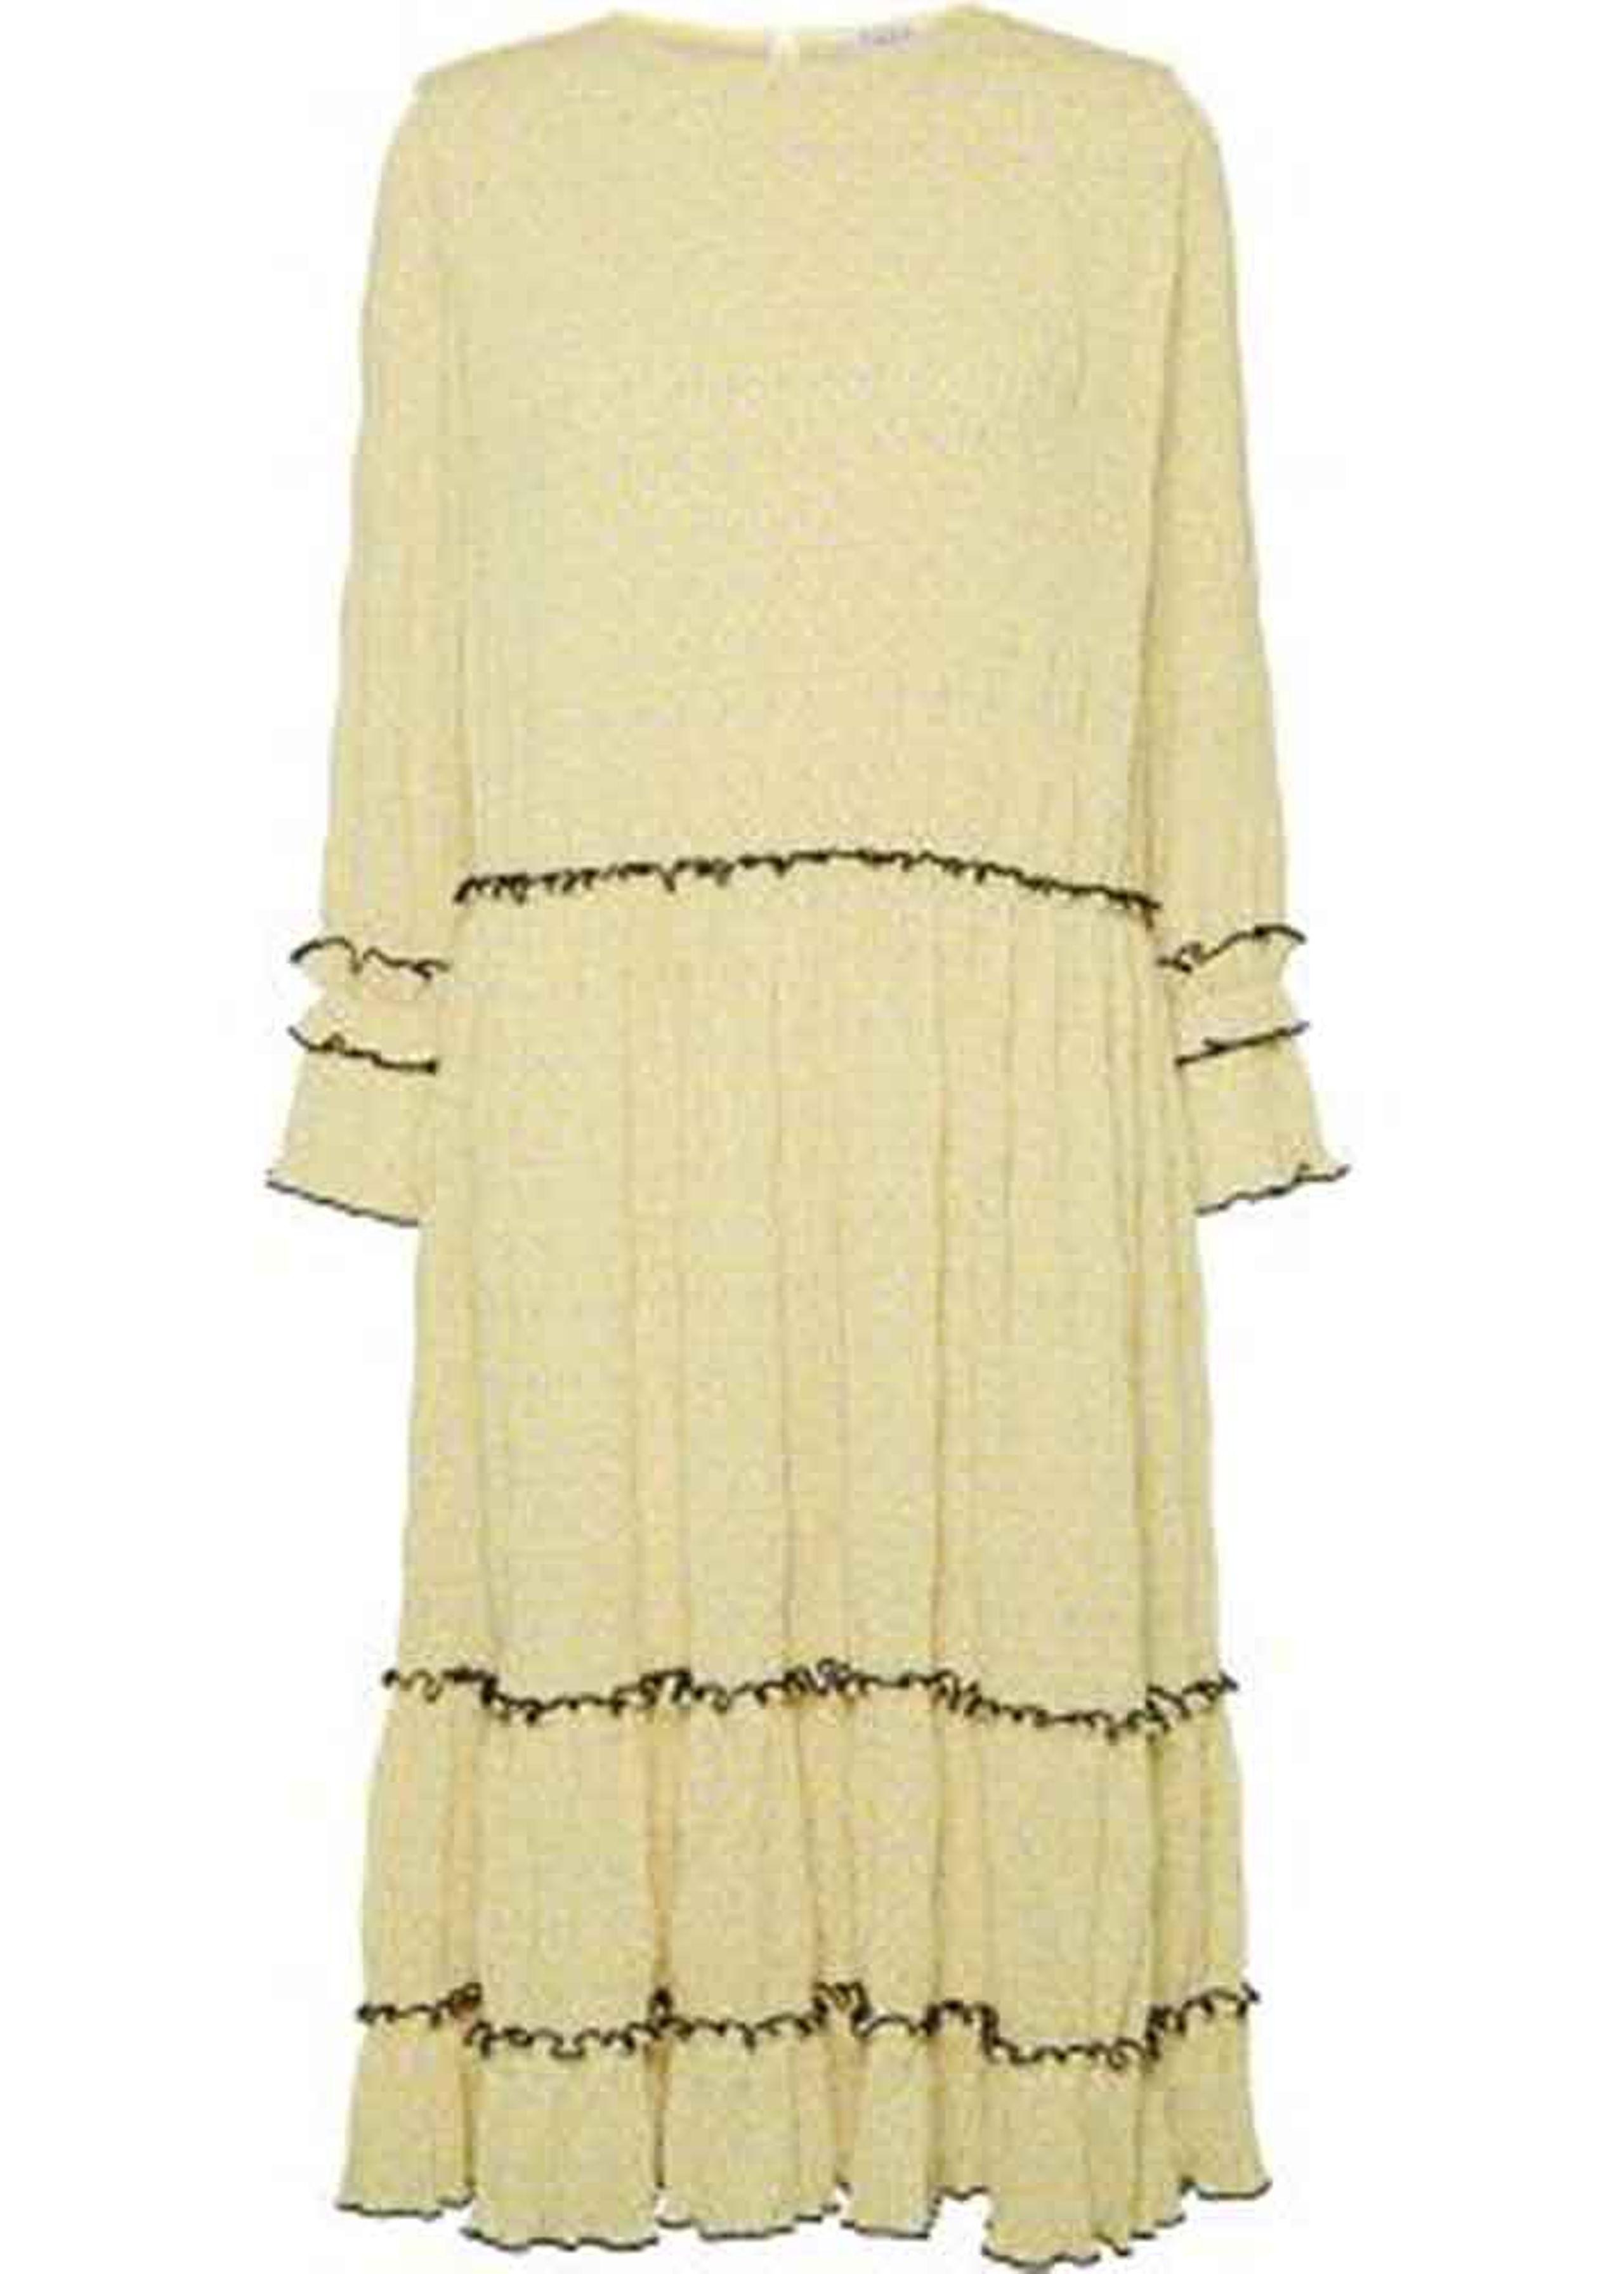 adb0ee2e NORR Mette dress - Gult print med sort piping Kjole Gul Print